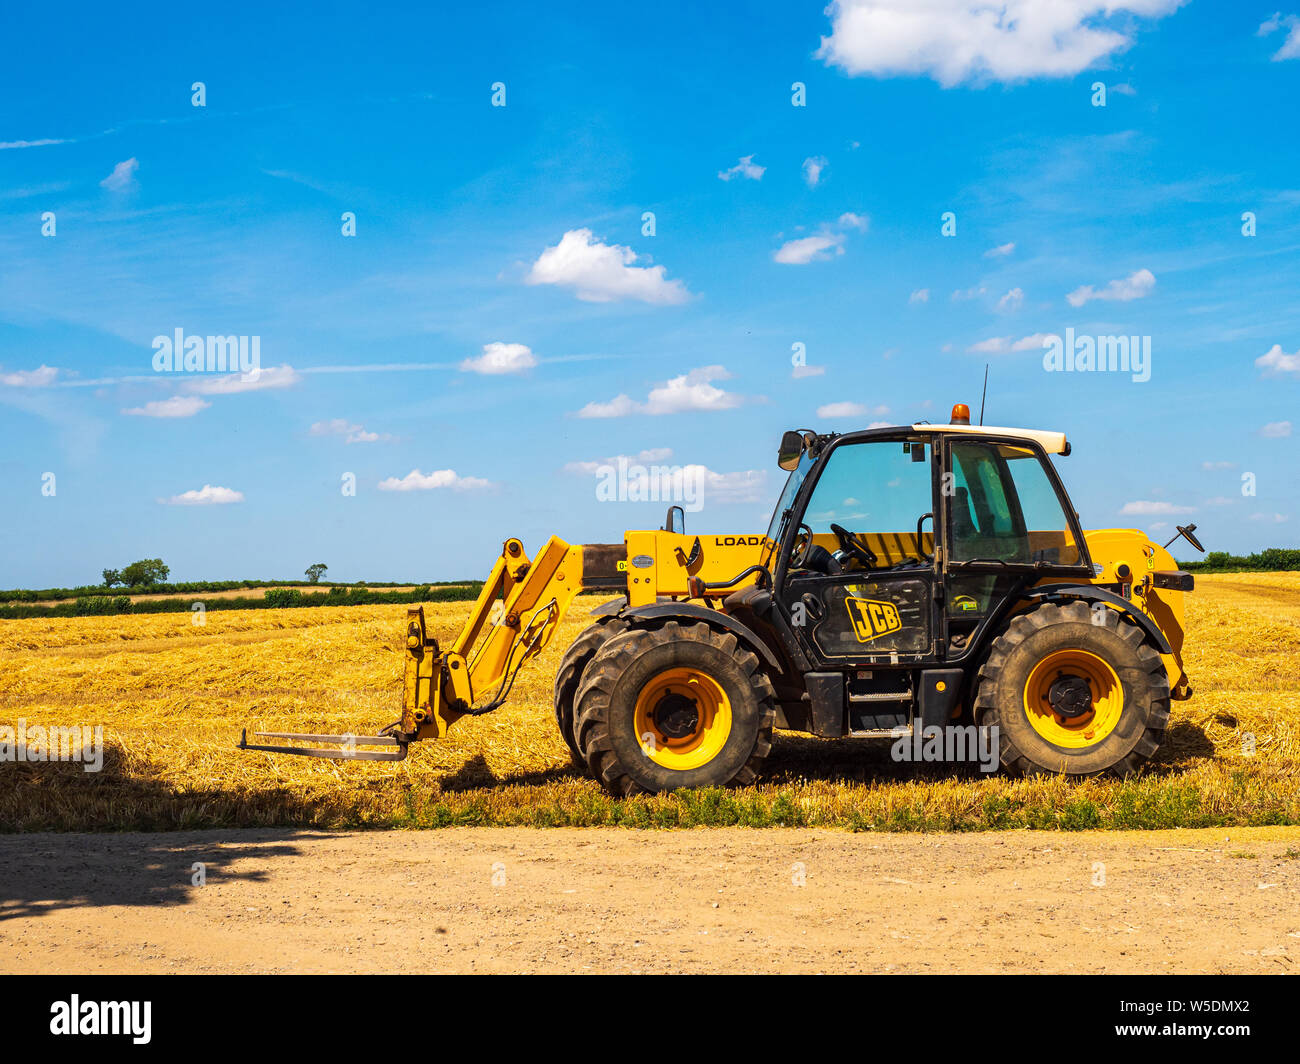 Teleporter Stock Photos & Teleporter Stock Images - Alamy